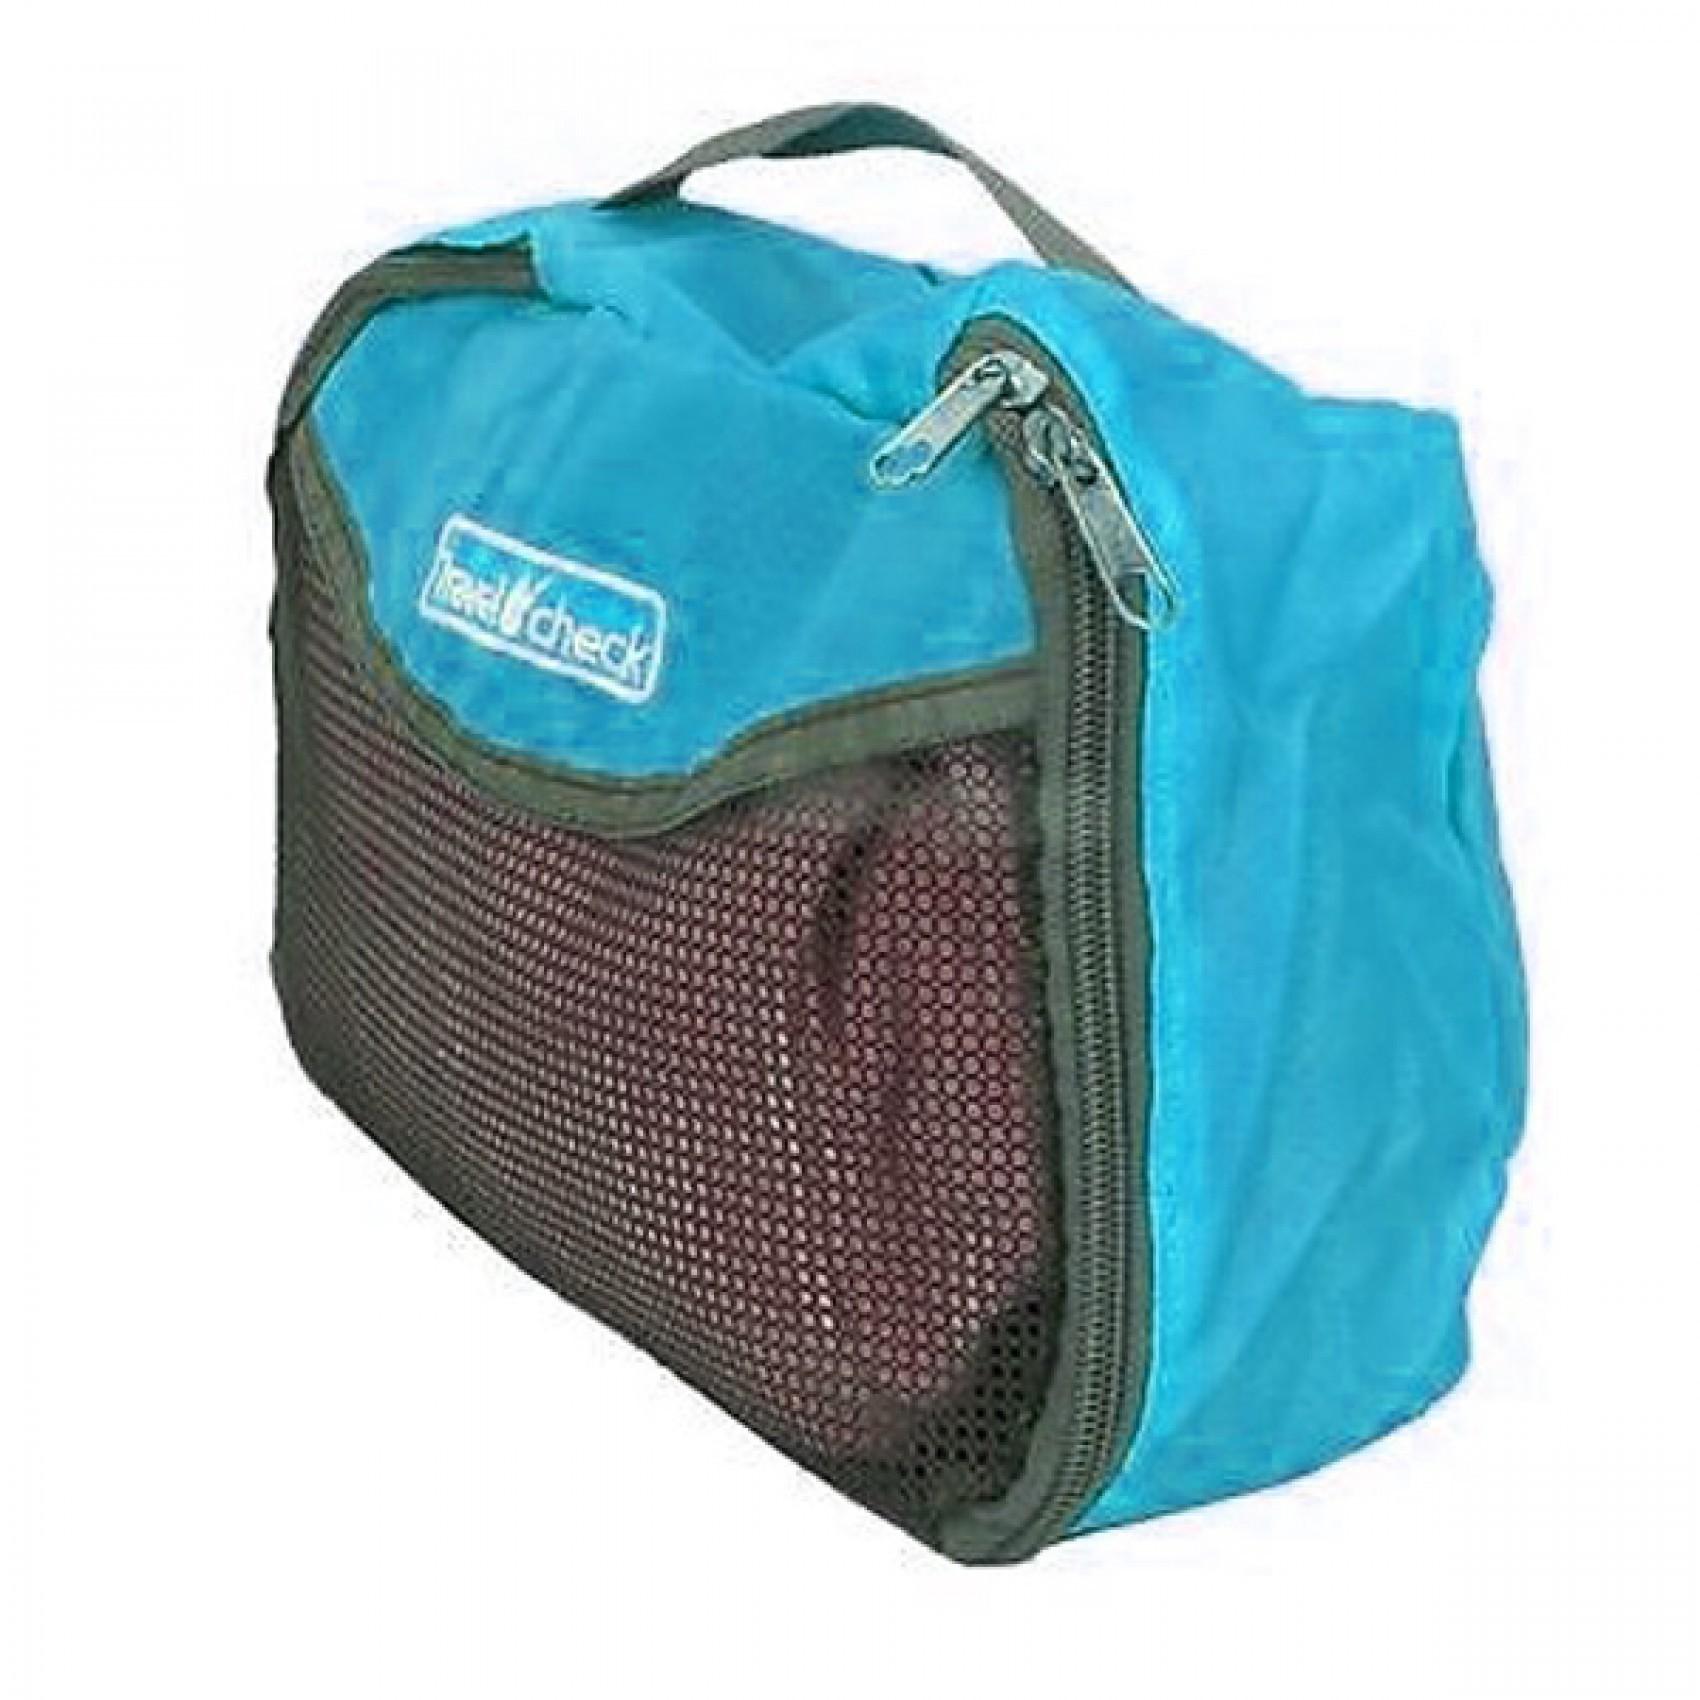 Generic Travel Check Luggage Organizer Bag – Blue (LGGEN00001BLU-0003428)